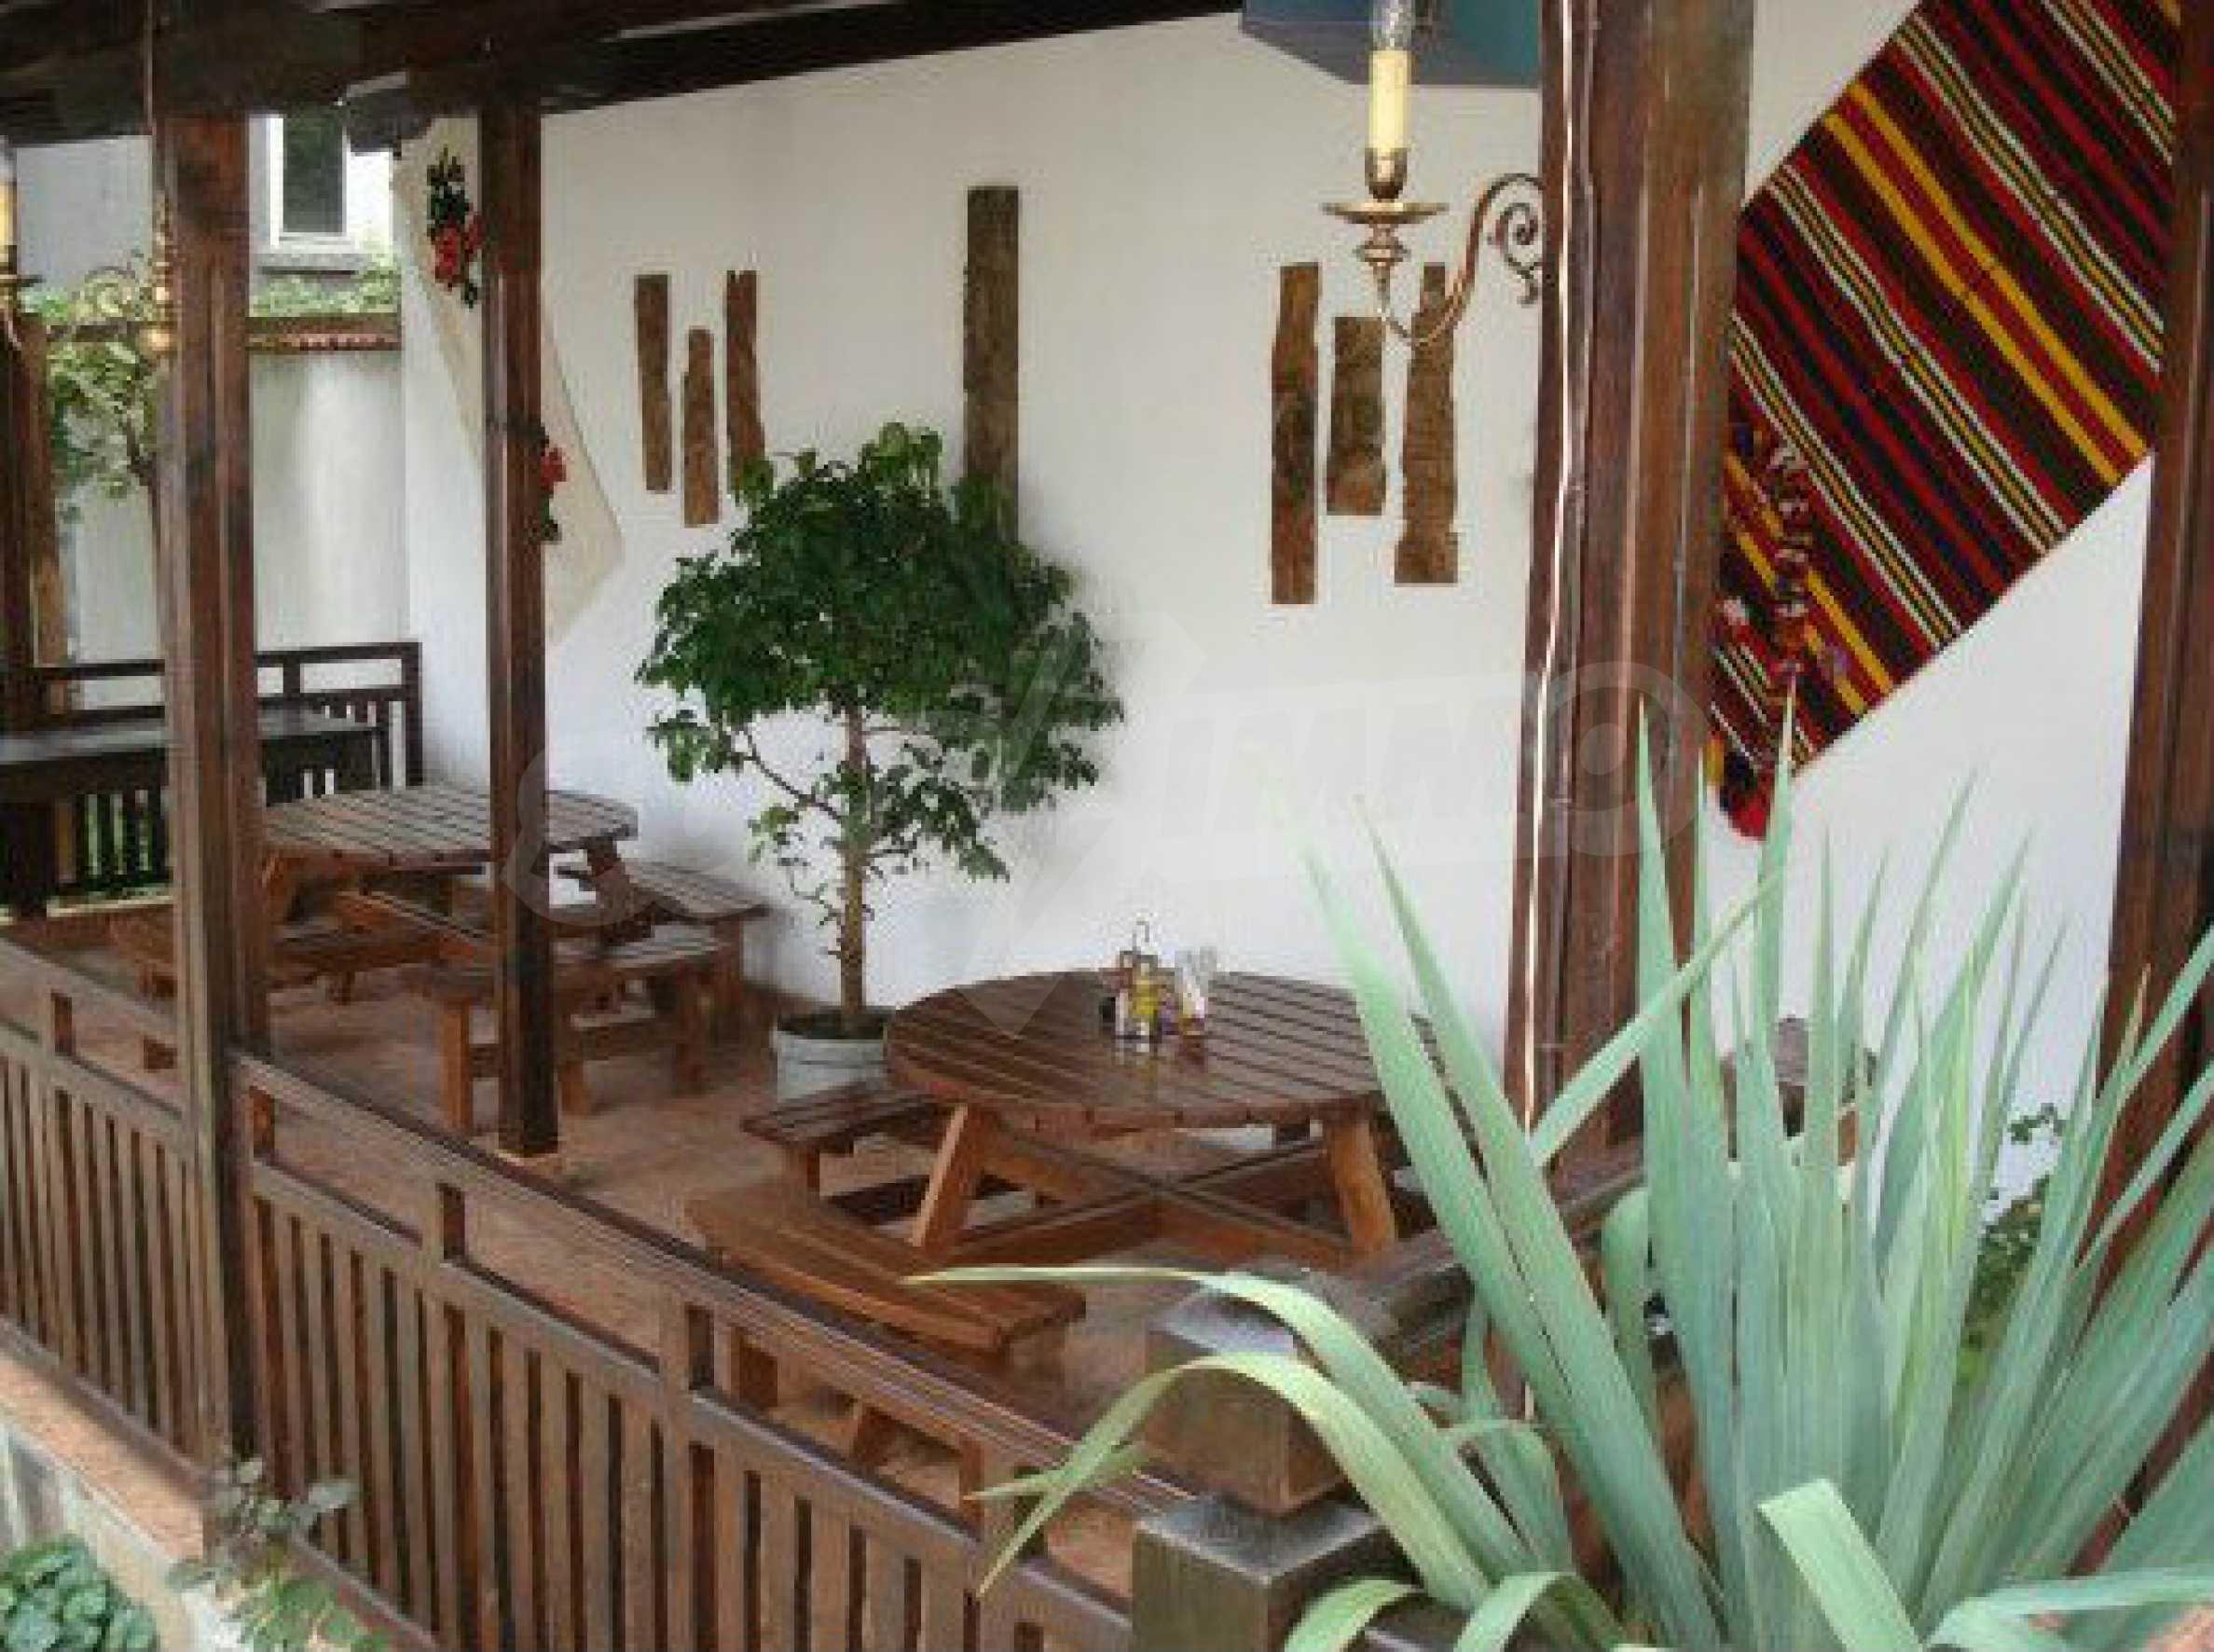 Hotelanlage mit Restaurant am Ufer des Flusses Osam in Lovech 64